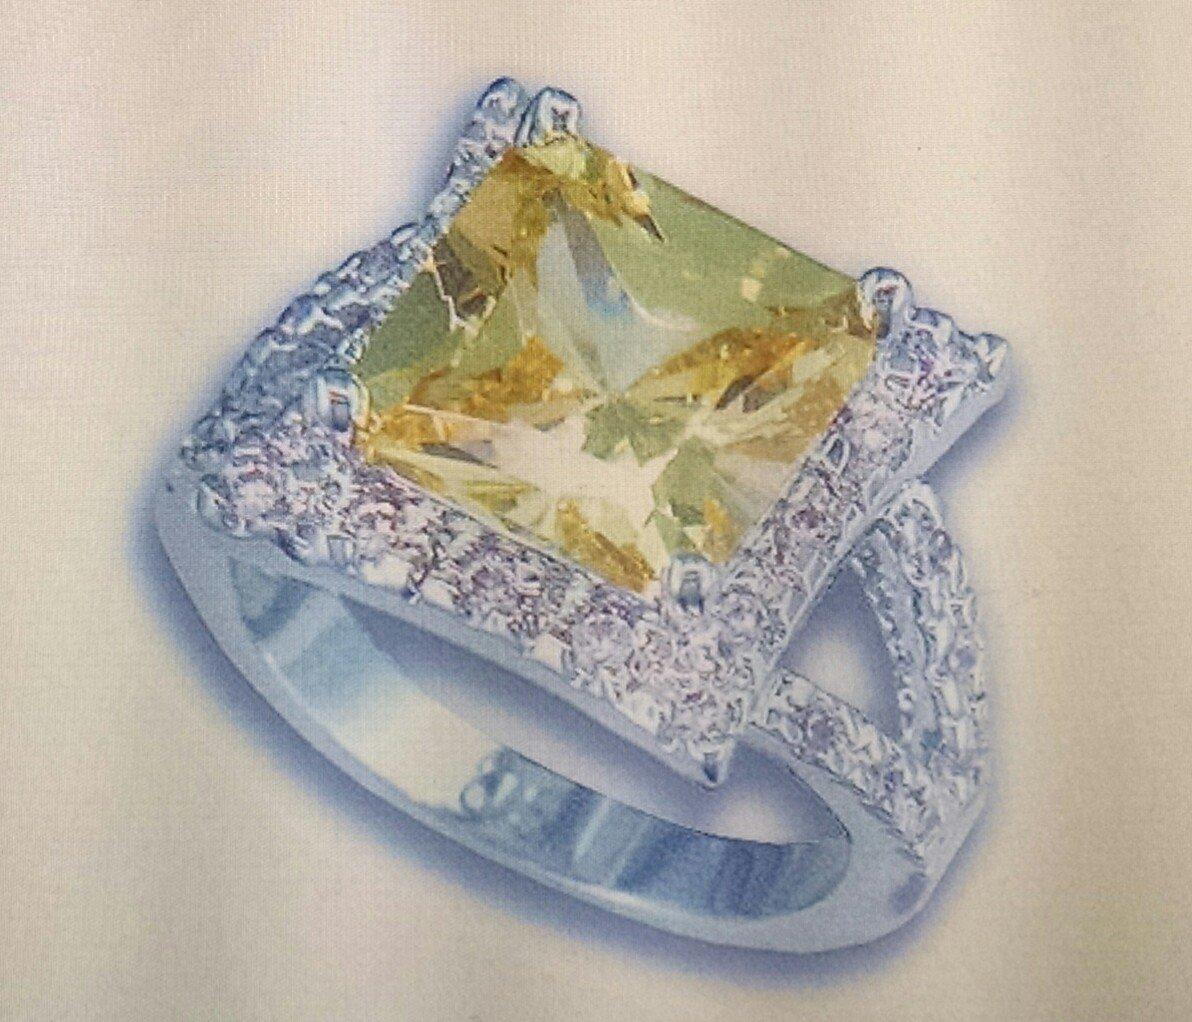 Lds Cubic Zirconia Fashion Ring #883